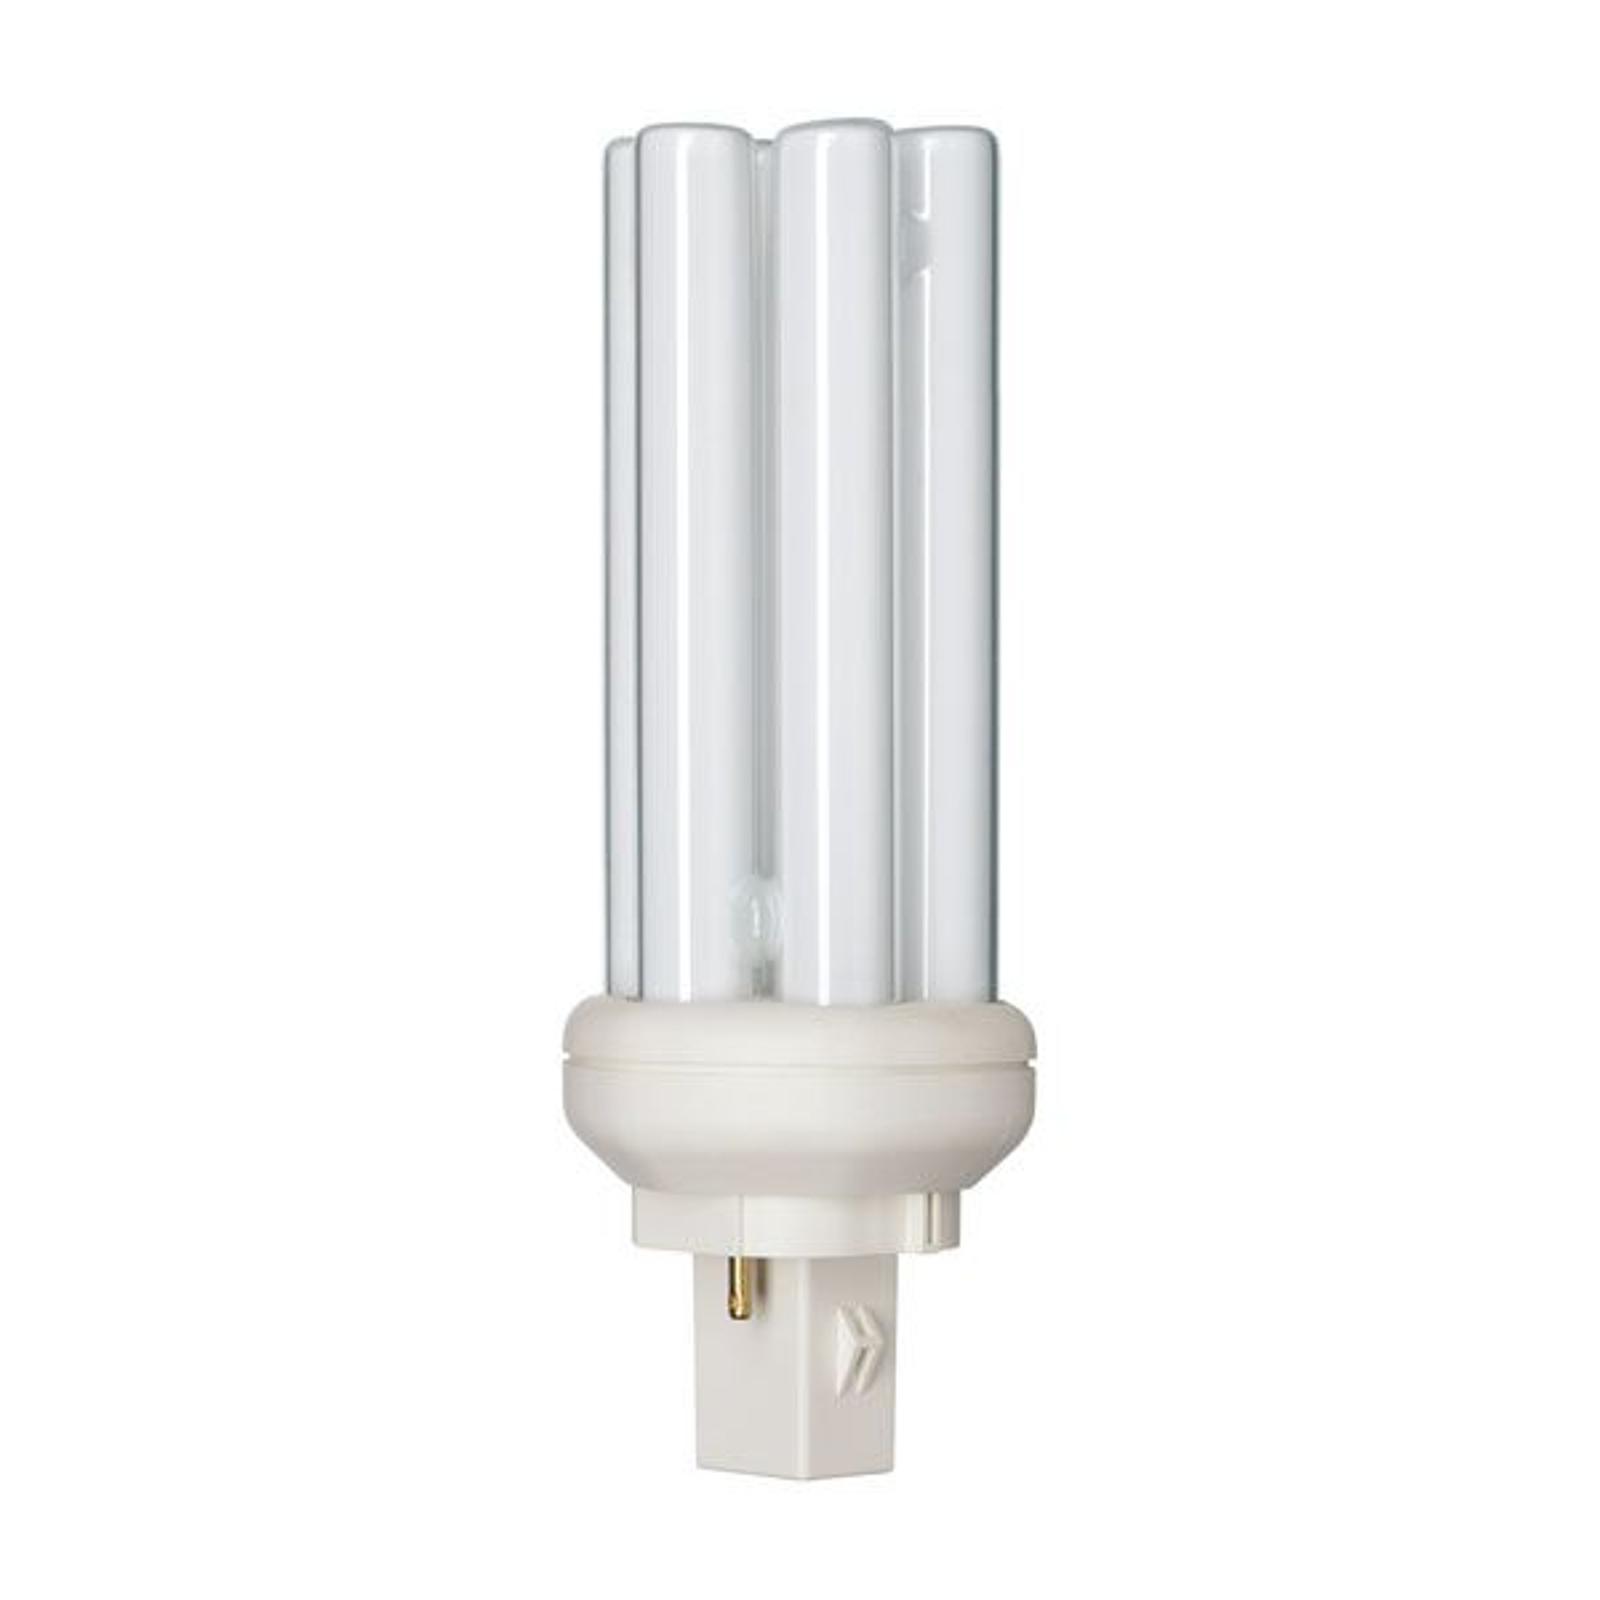 GX24d Kompaktleuchtstofflampe Master 13W PL-T 840